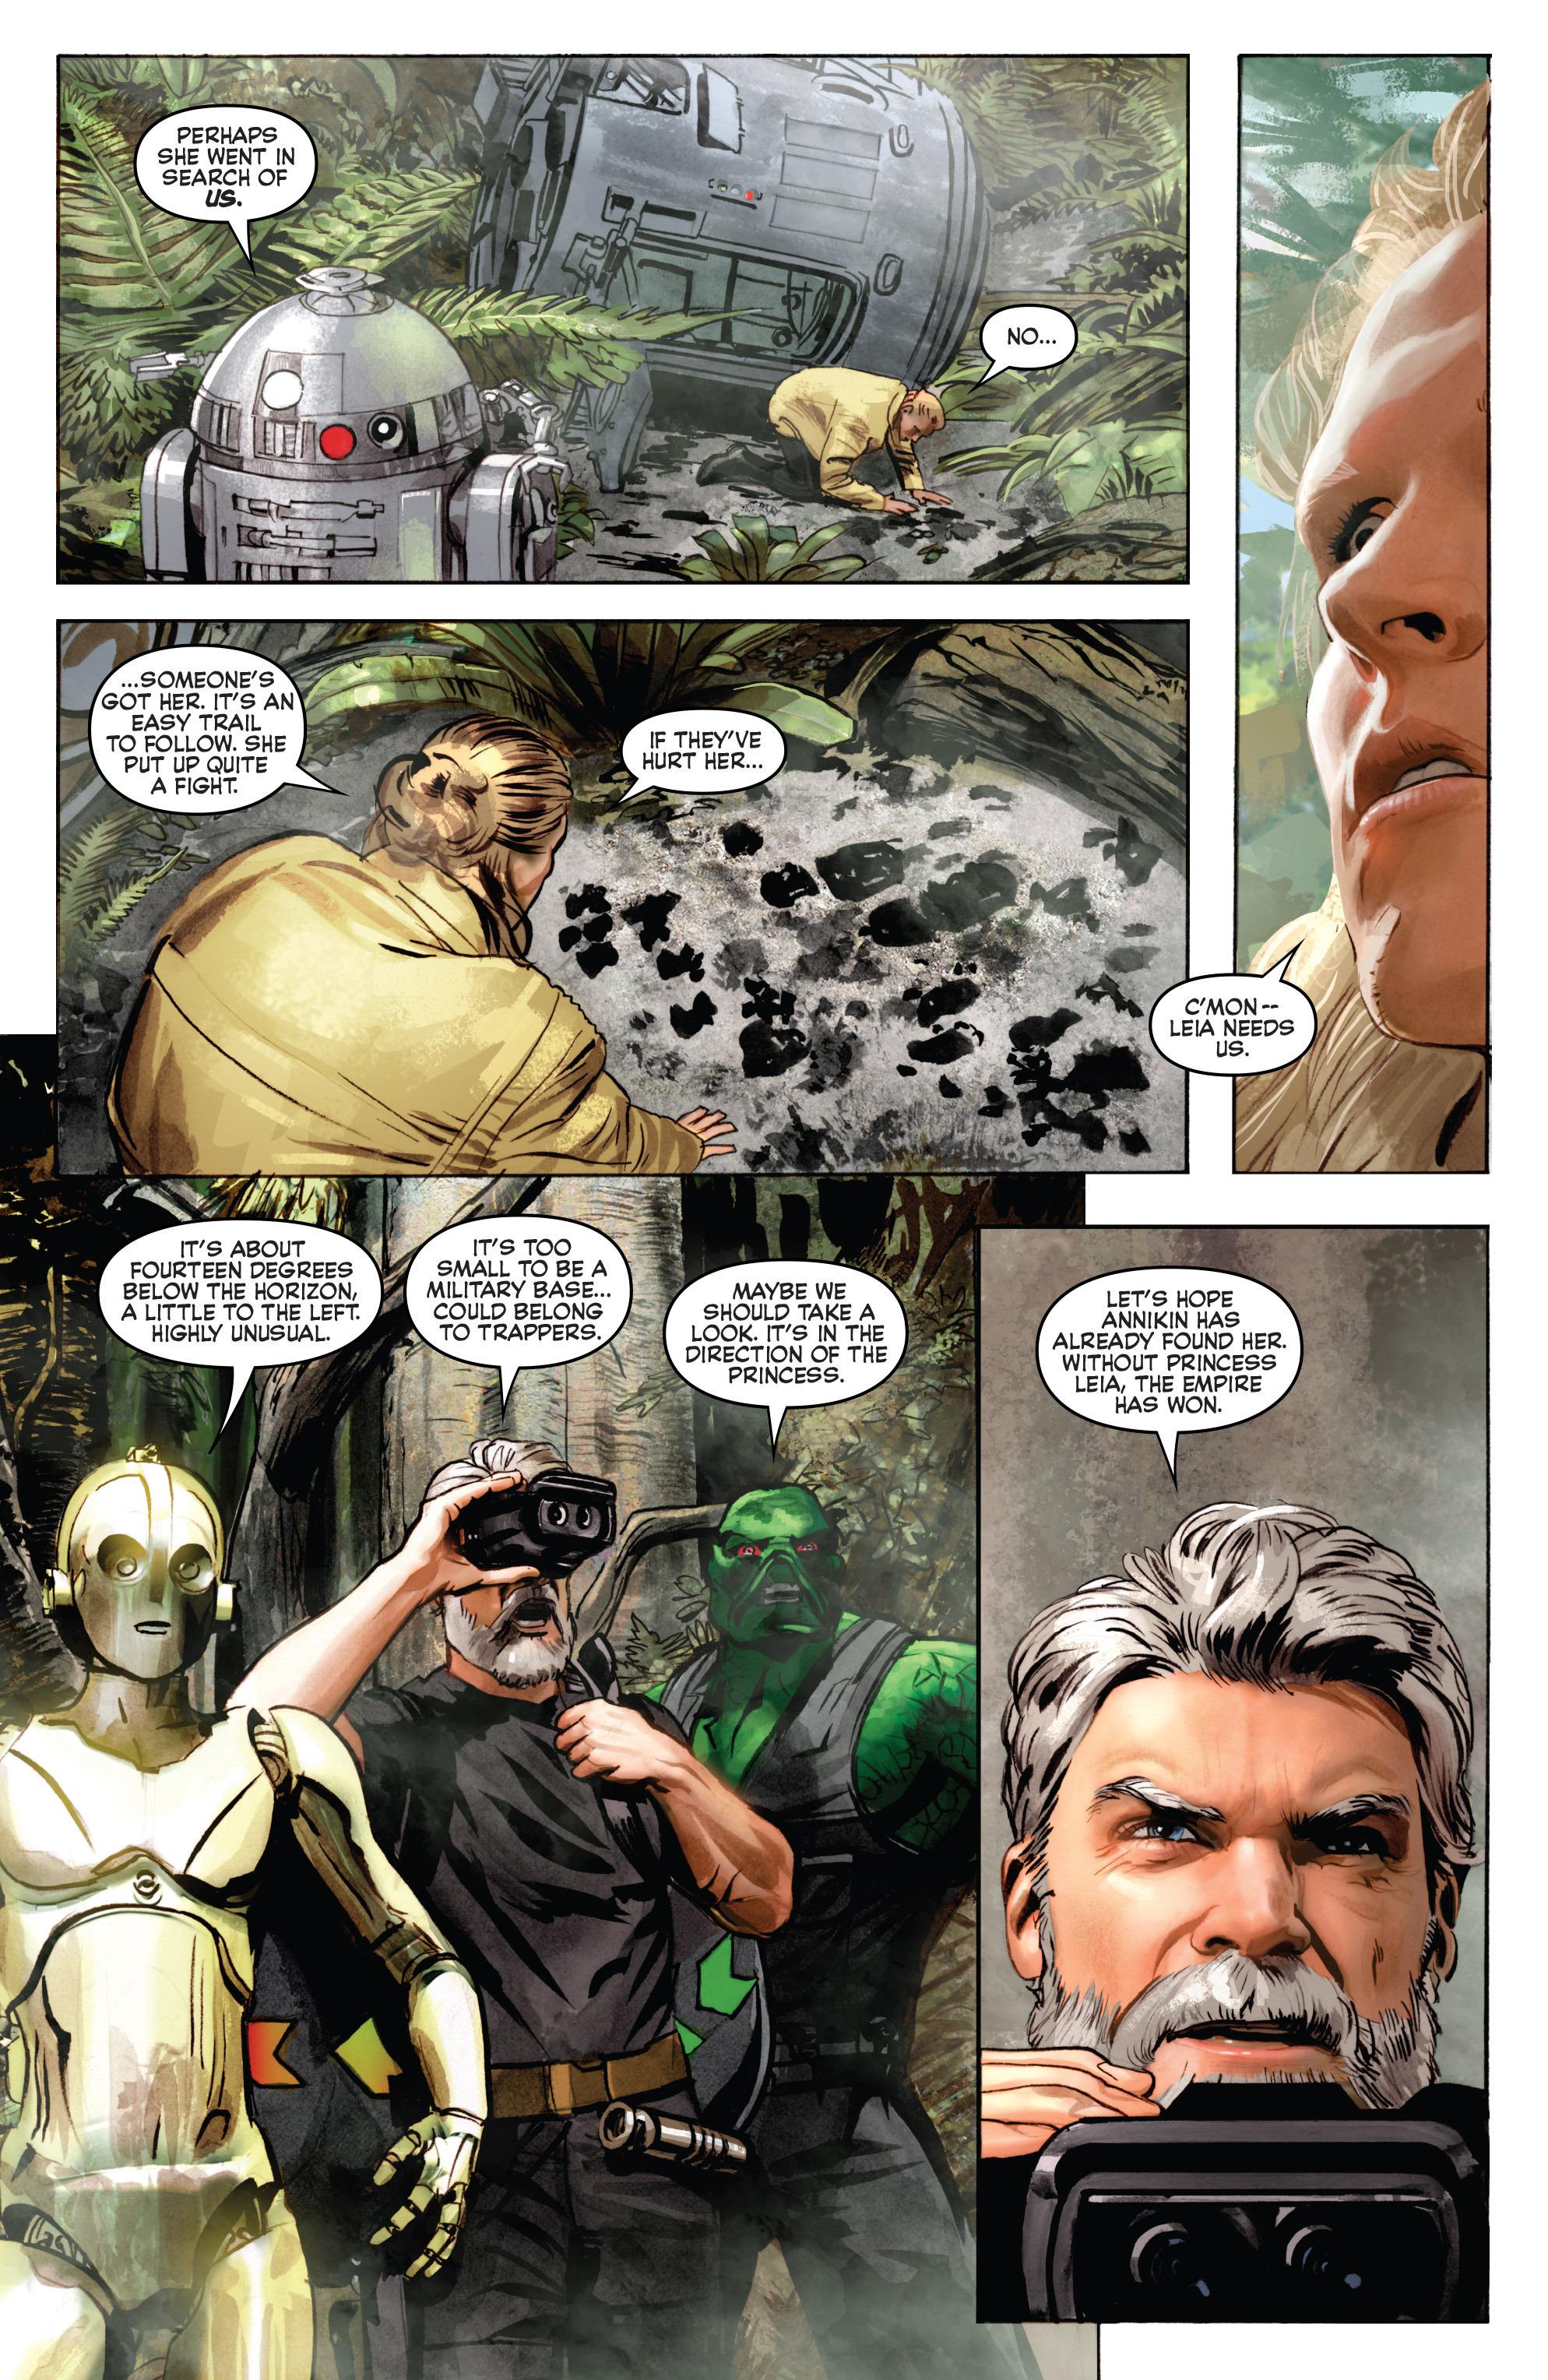 THE STAR WARS comic (2015, Marvel edition) Vol.7 15